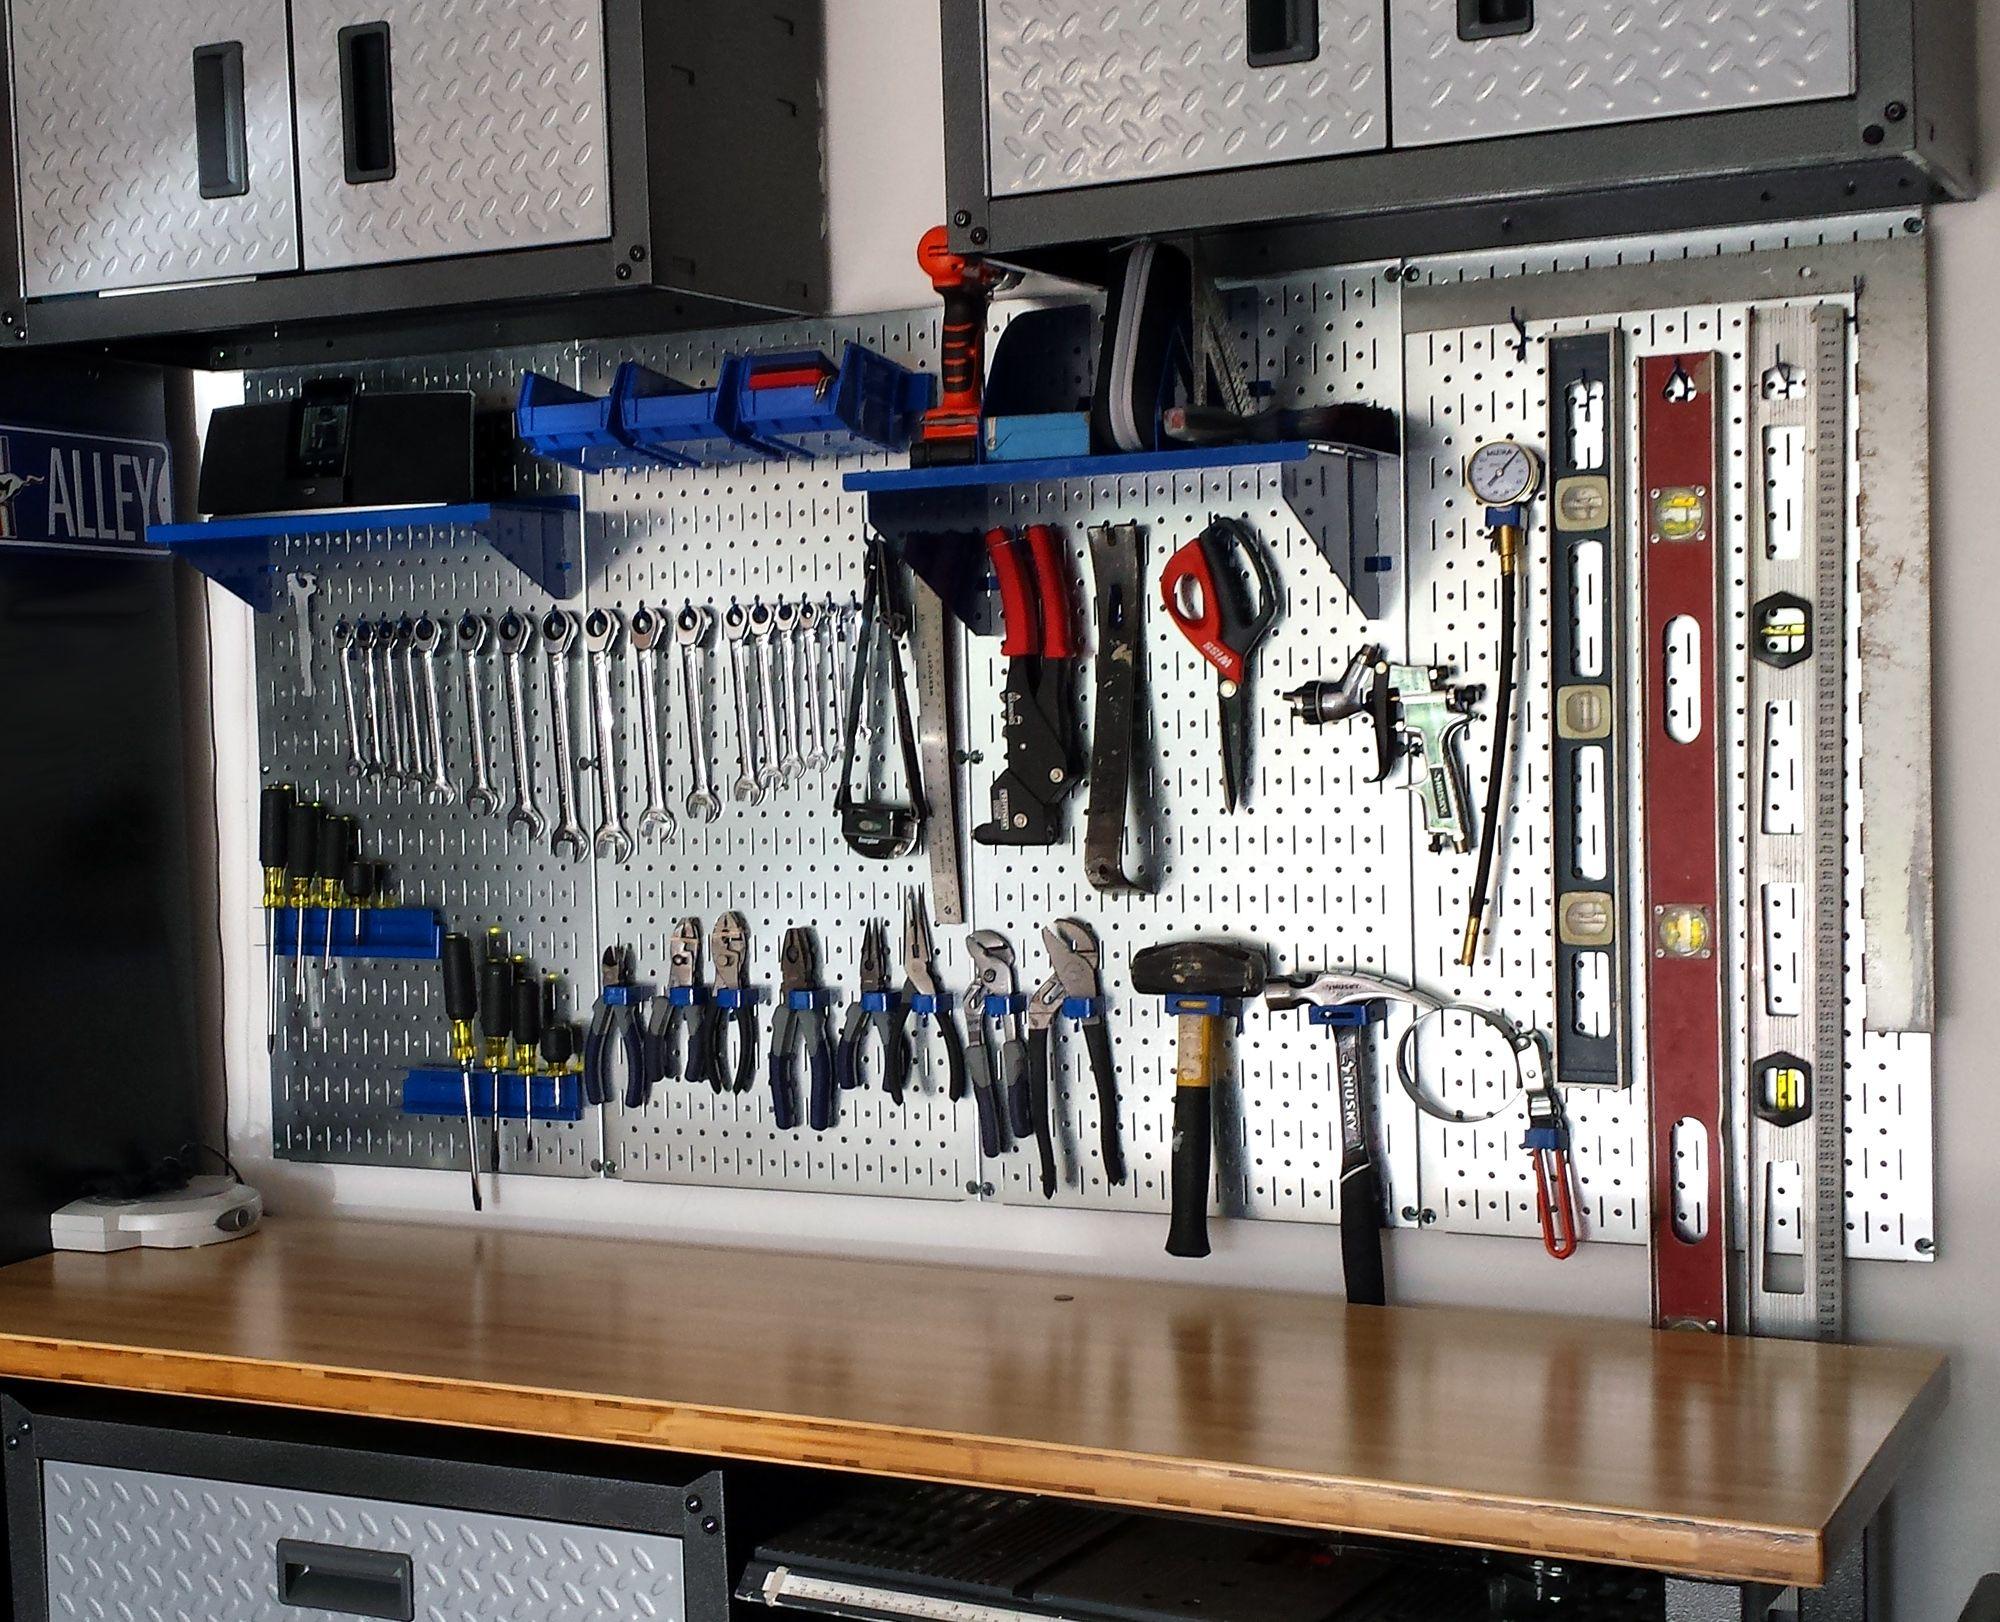 More Ideas Below Workout Diy Pegboard Hooks Hacks Pegboard Tools Storage Painted Di Garage Wall Organizer Garage Tool Organization Garage Storage Organization